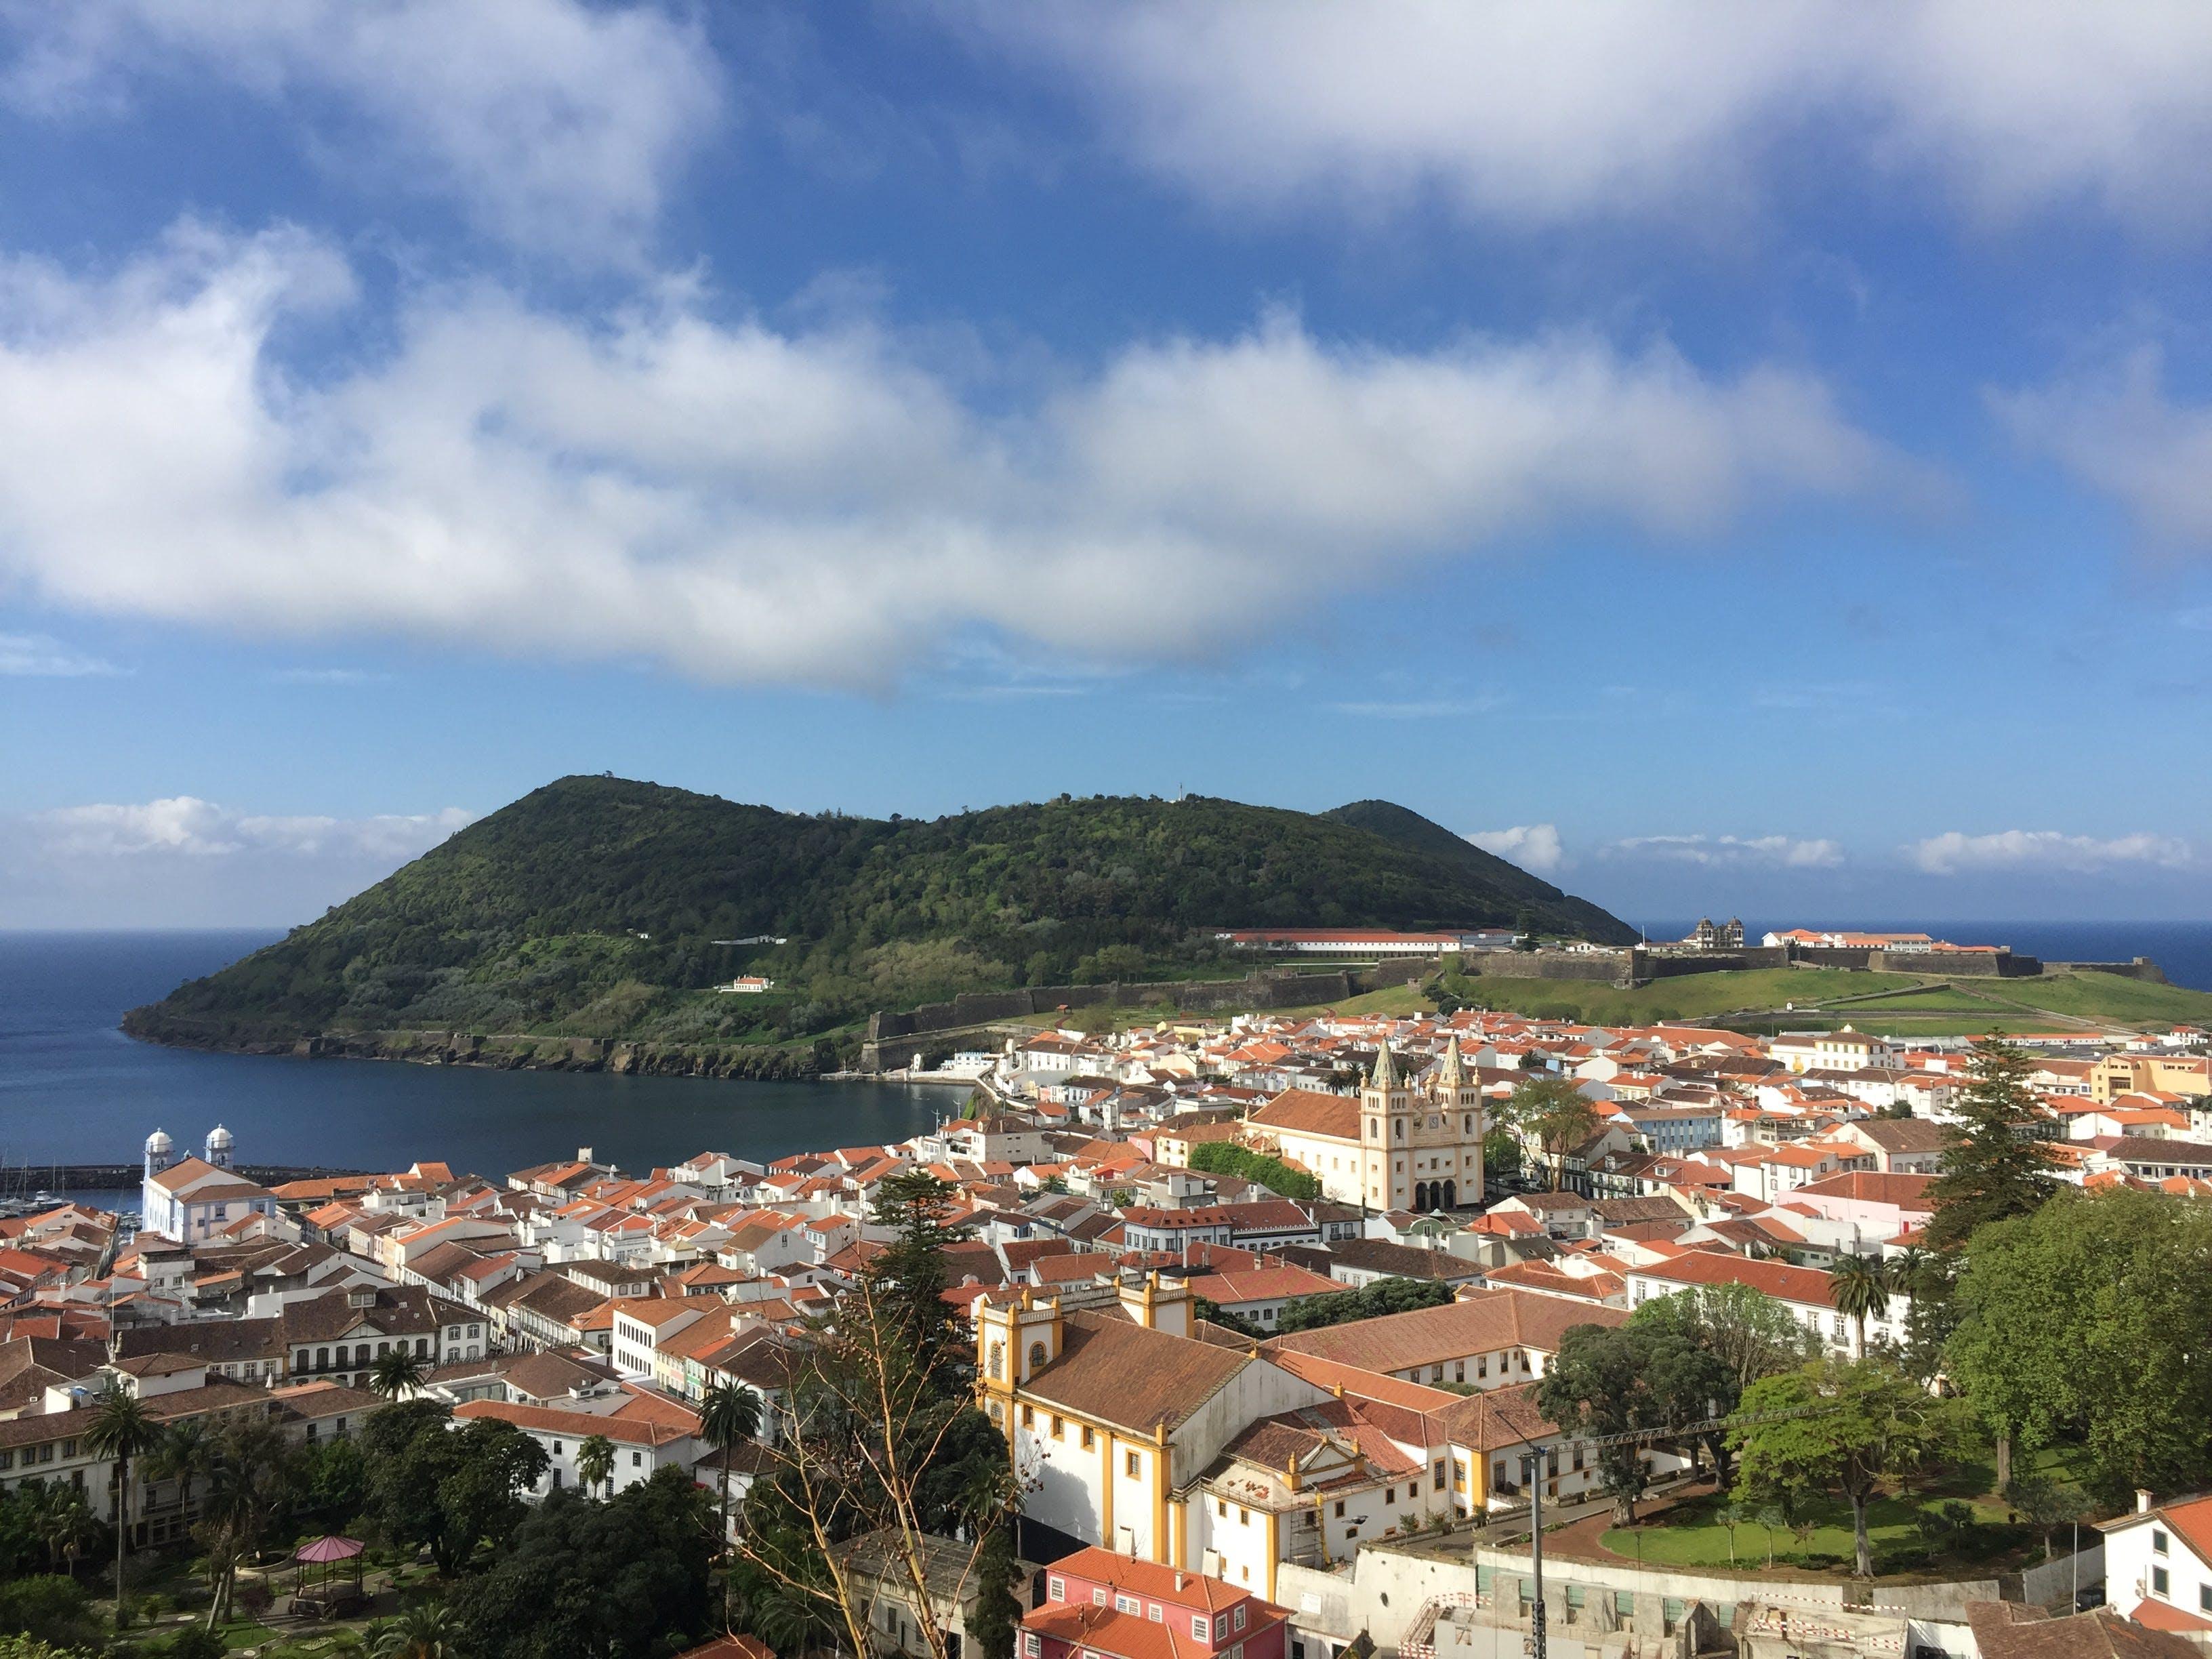 Free stock photo of Angra do heroismo, Islas azores, Terceira